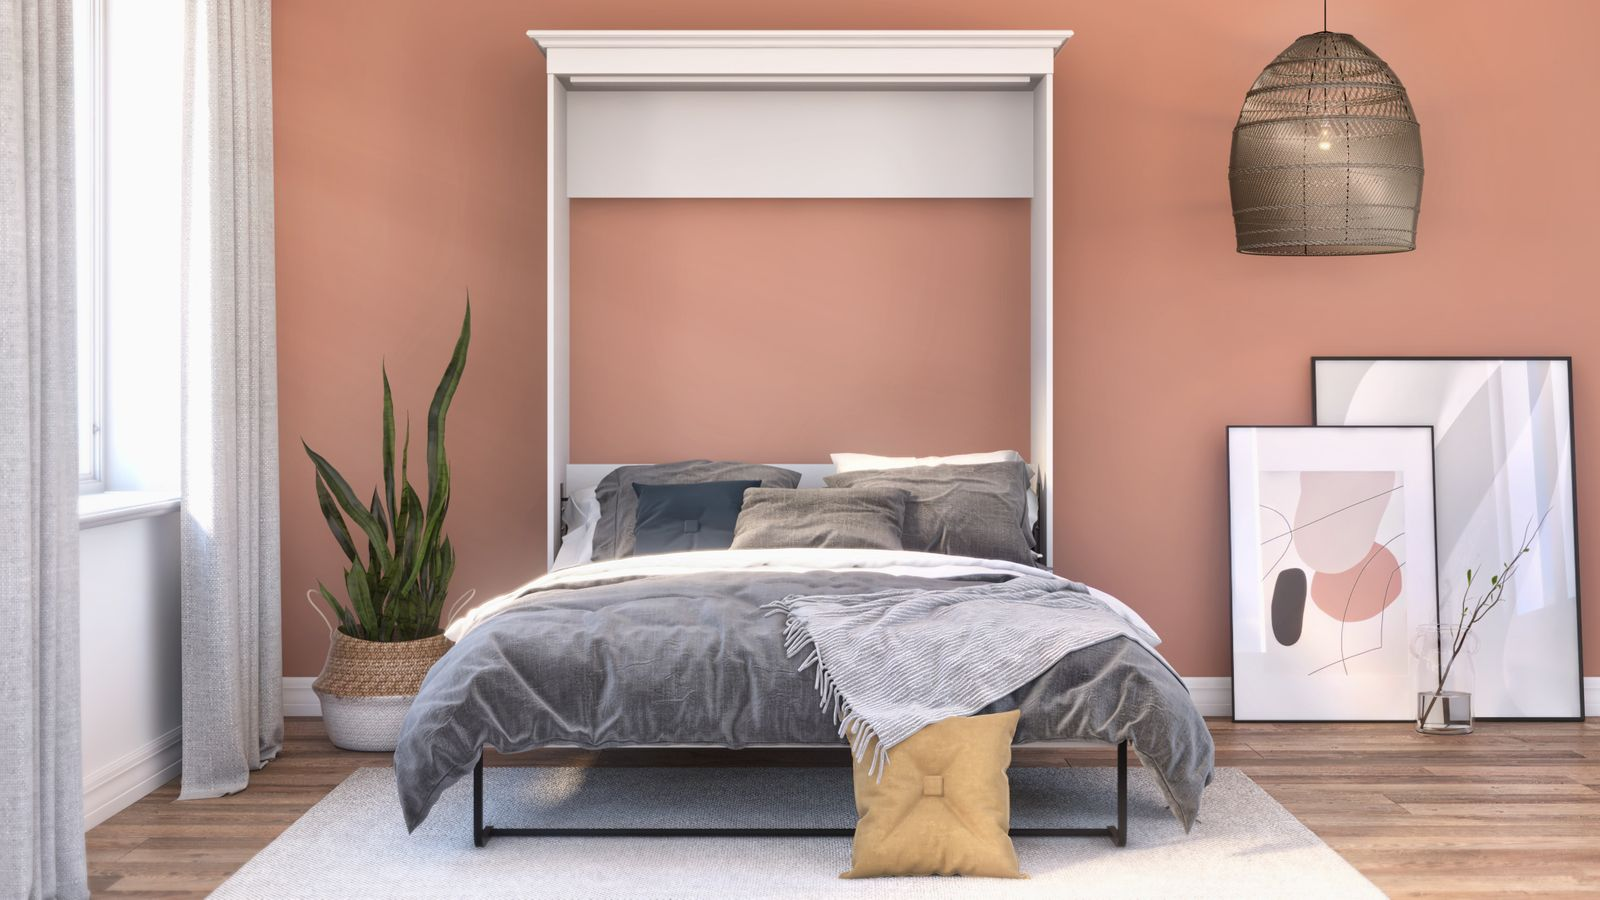 Chambre contemporaine avec un mur corail